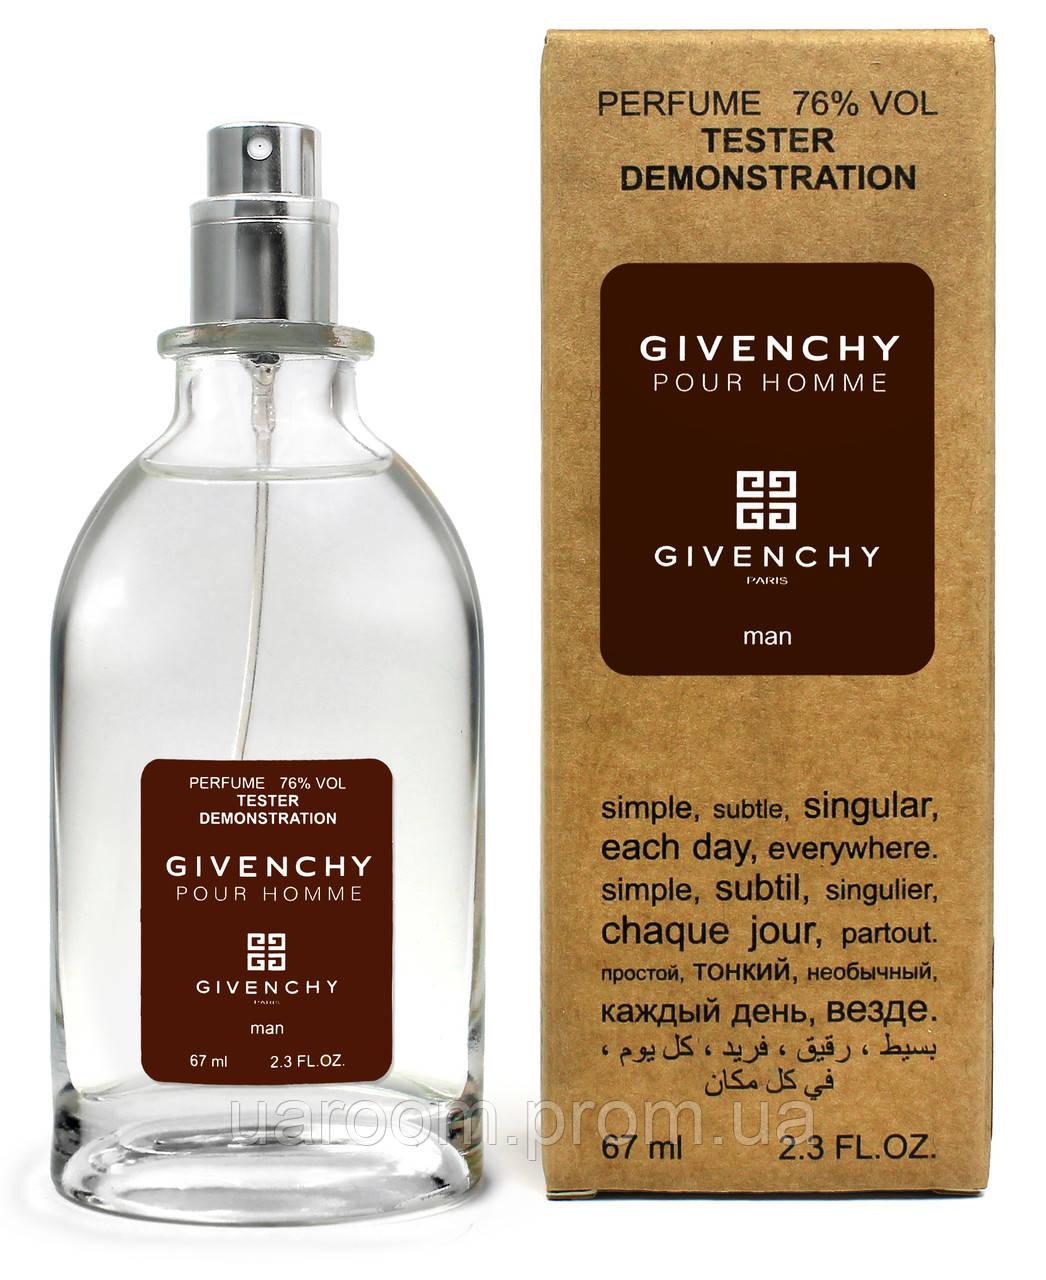 Тестер чоловічий Givenchy Pour Homme, 67 мл.